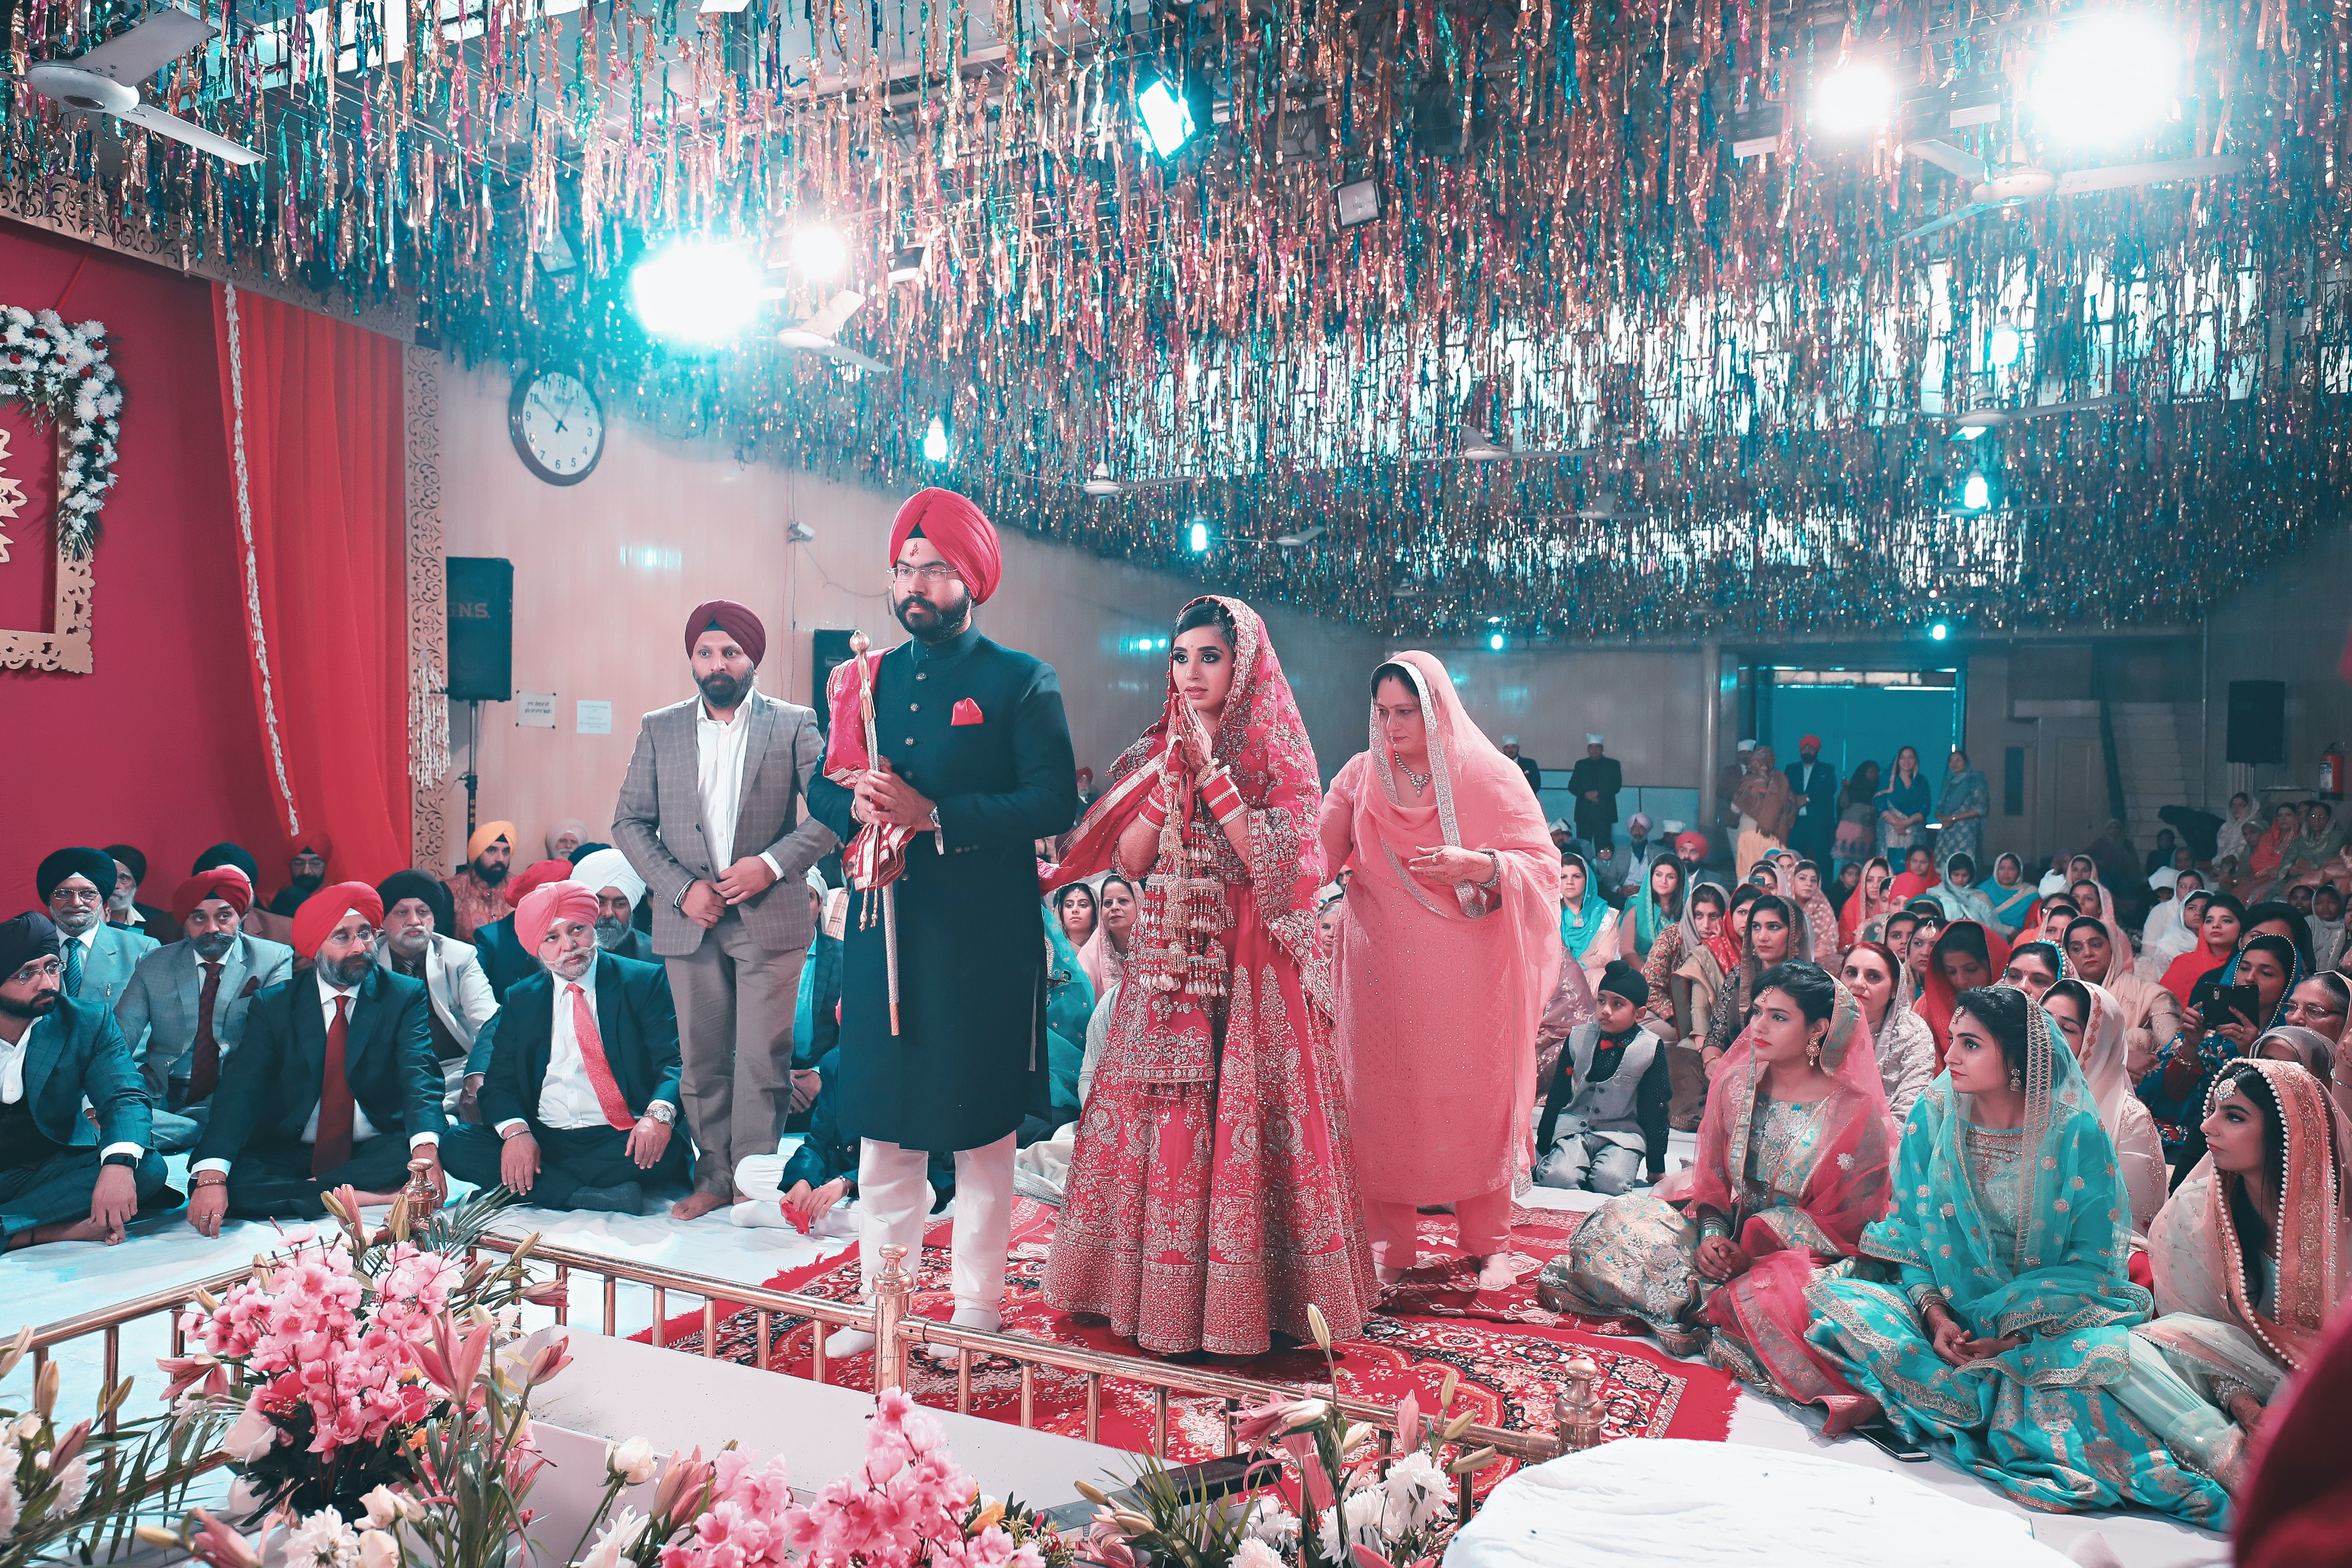 Free stock photo of wedding photographer Chandigarh